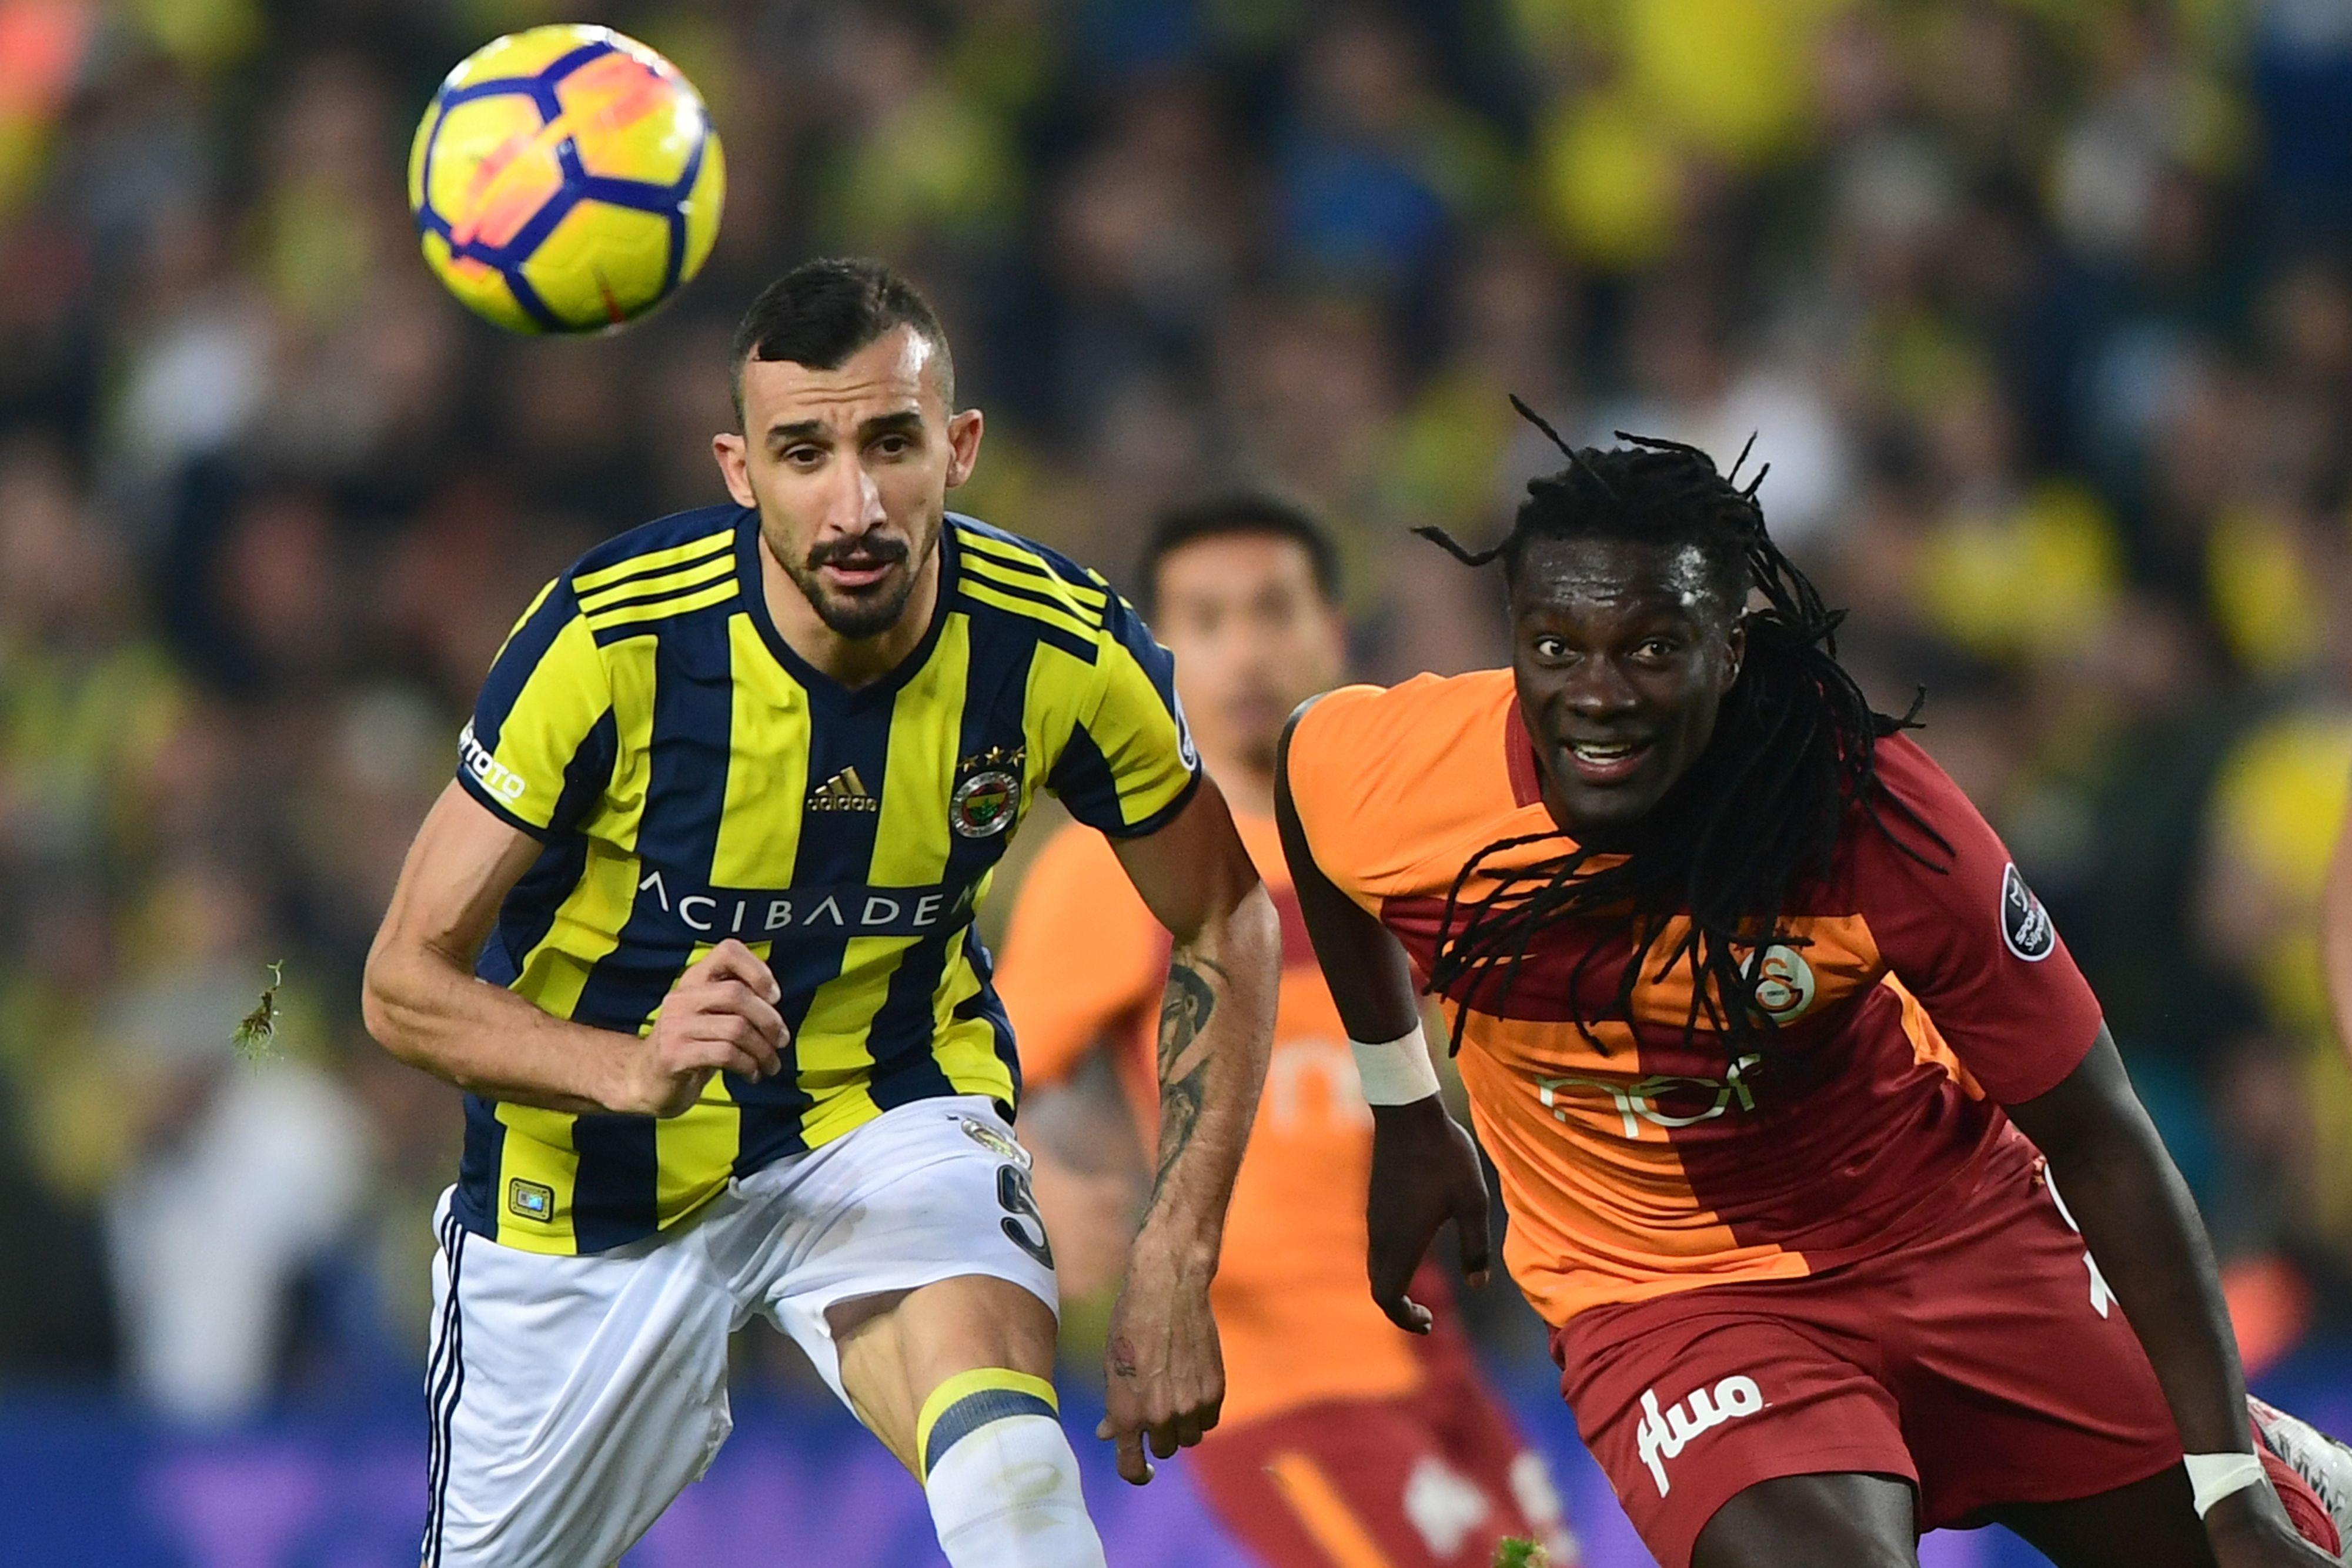 Football - Etranger - Turquie : Fenerbahçe-Galatasaray en direct